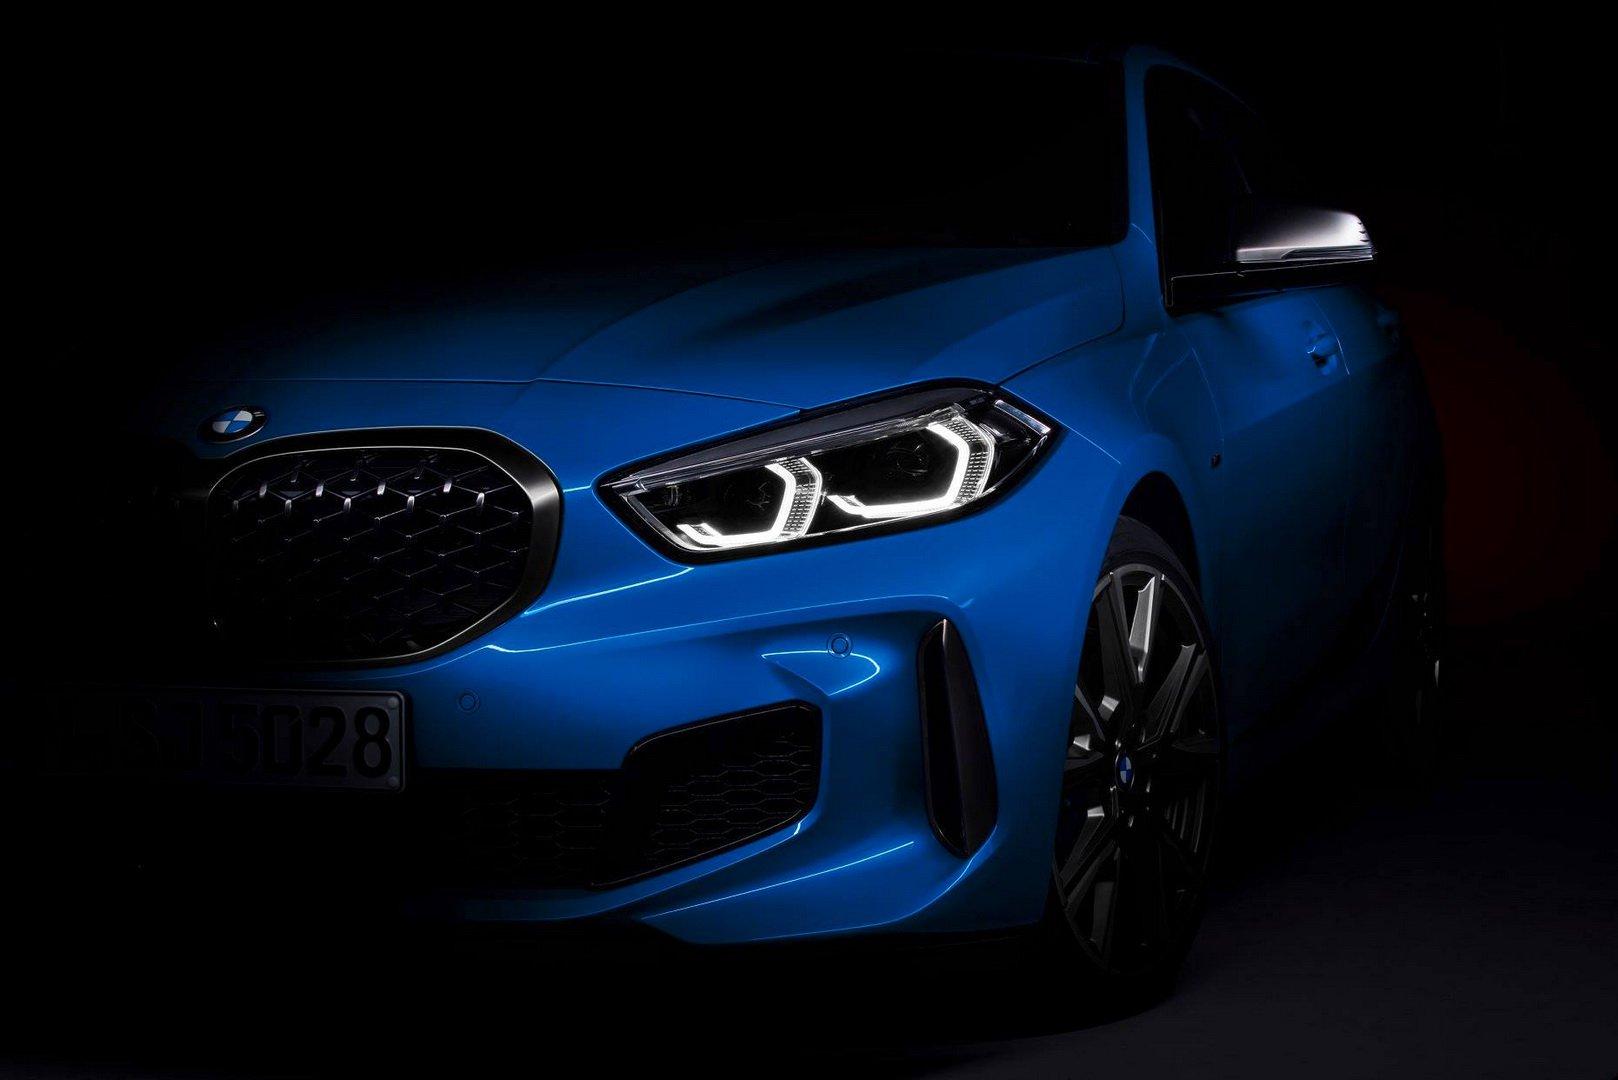 2019 BMW 1 Series image 1